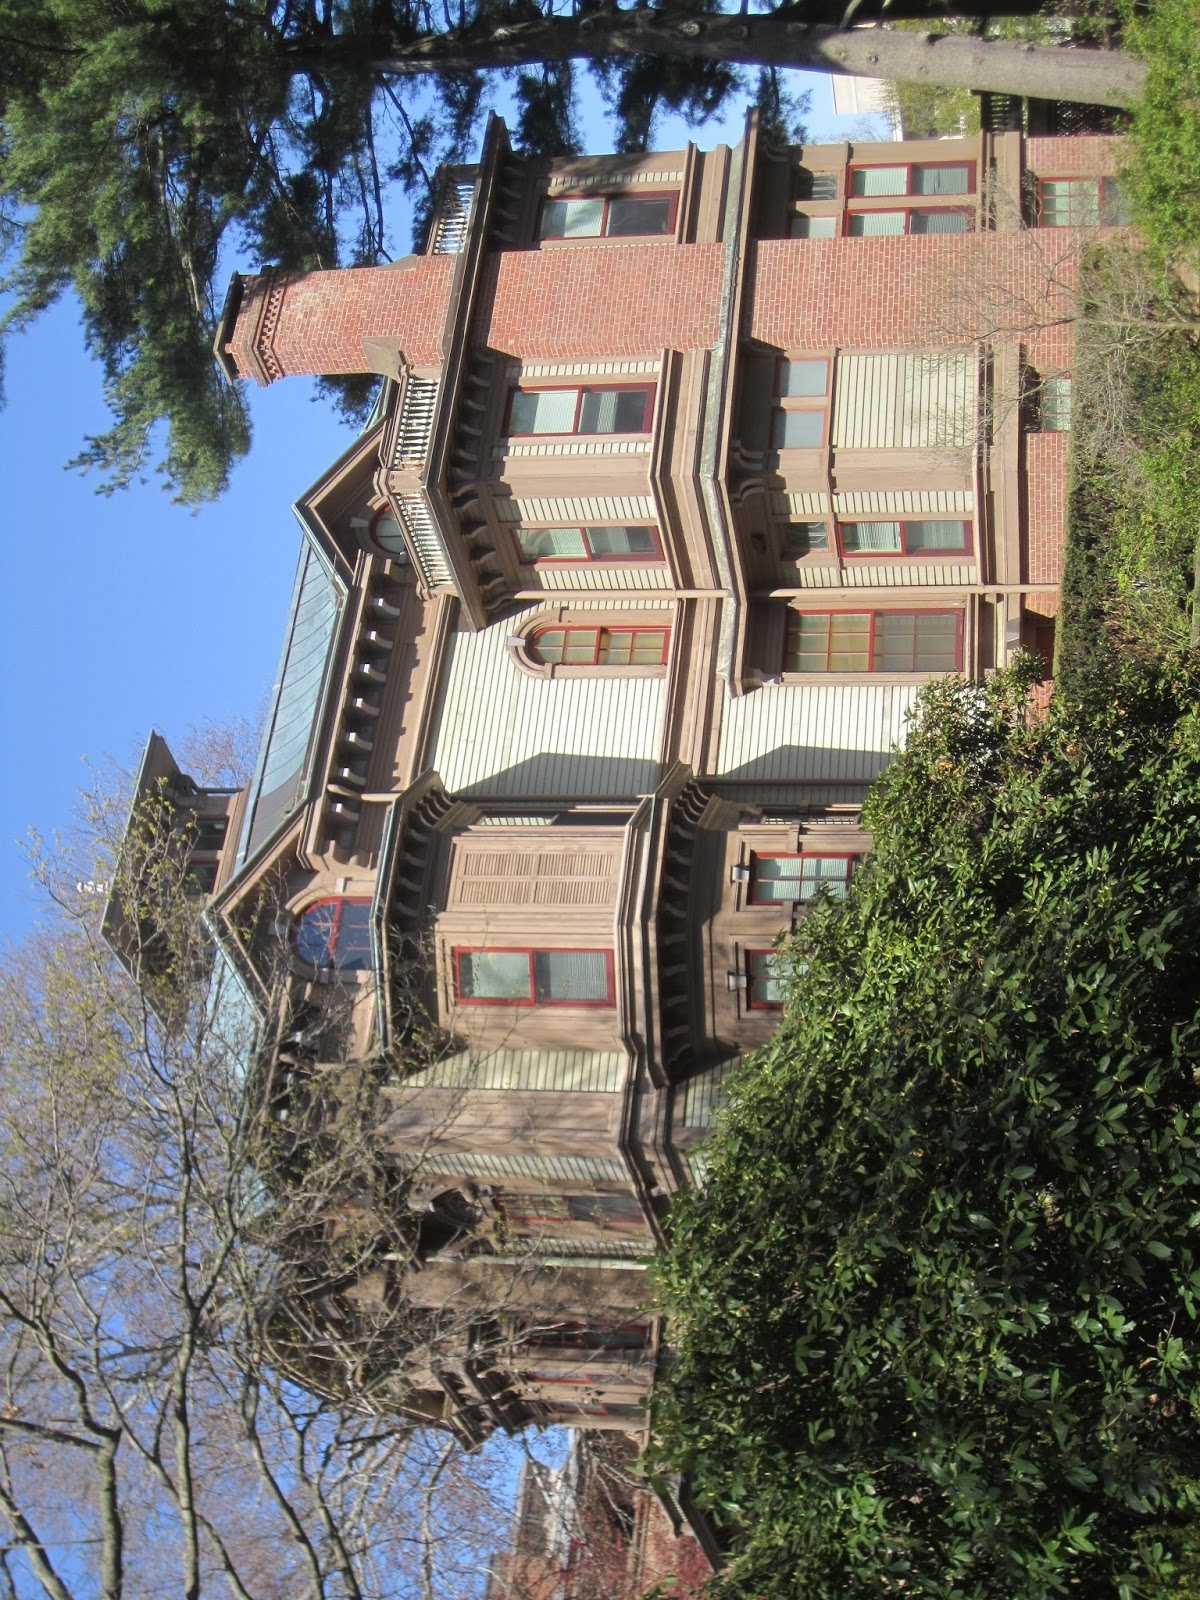 The Picturesque Style Italianate Architecture April 2013